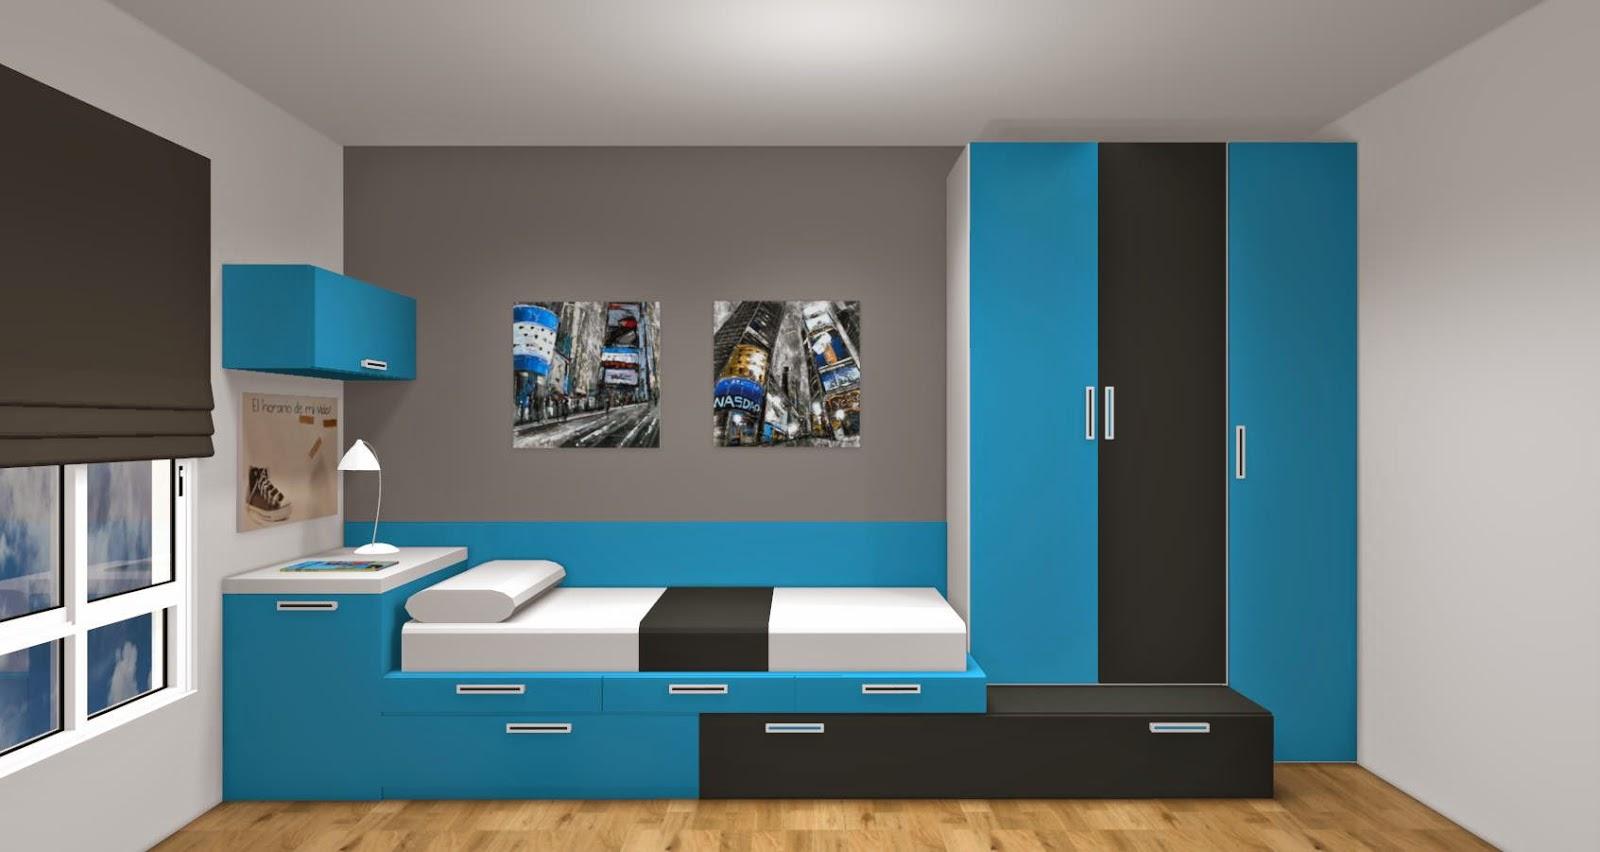 Habitaciones de dise o juveniles for Diseno de interiores habitaciones juveniles